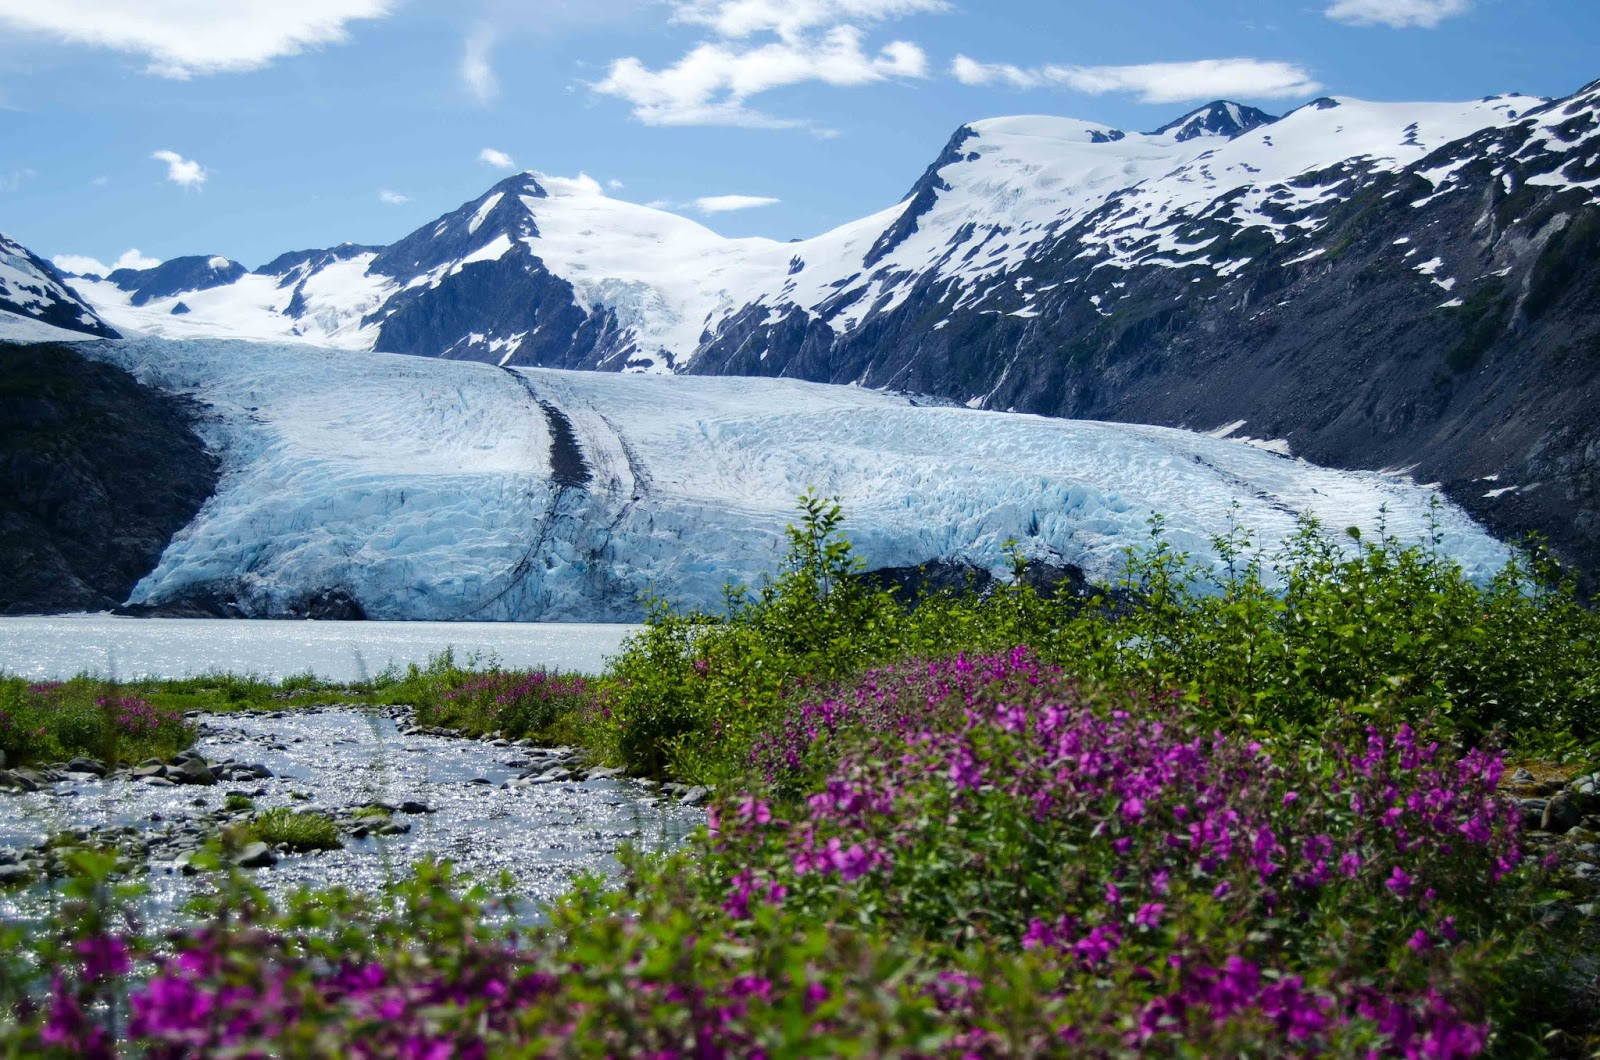 File:Portage Glacier Alaska.jpg - Wikimedia Commons